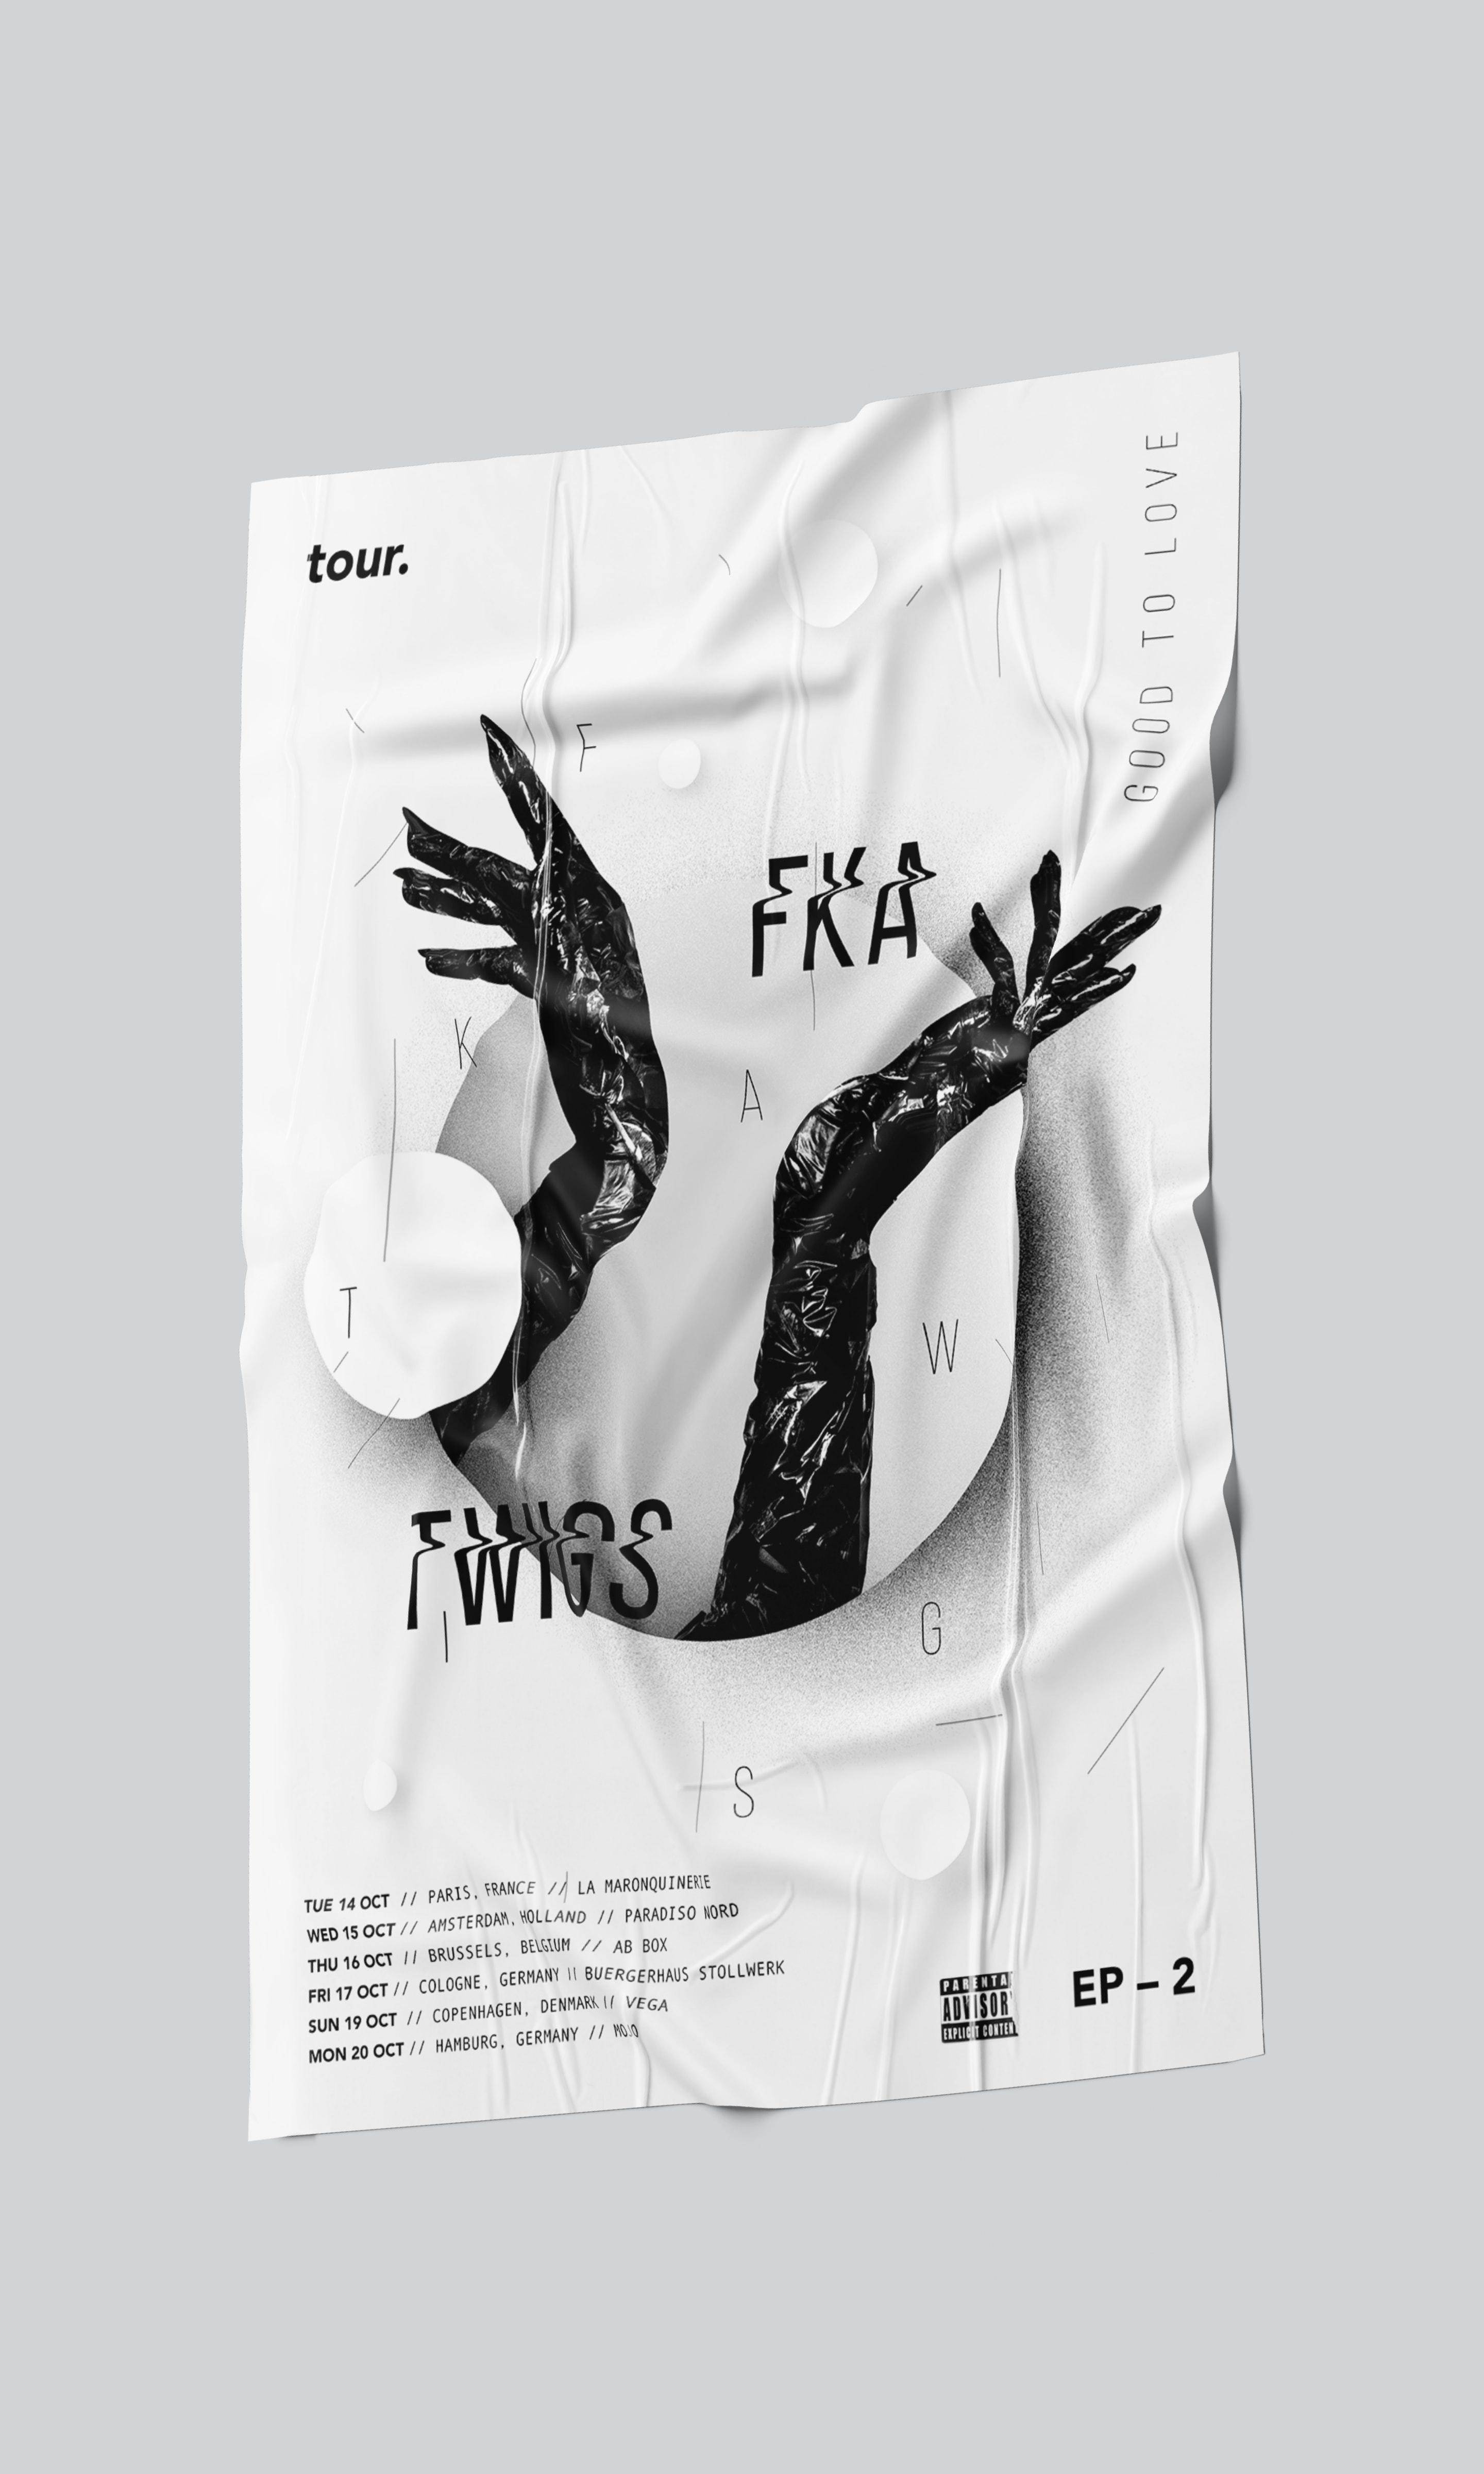 Case-Overview-FKA-twigs-7